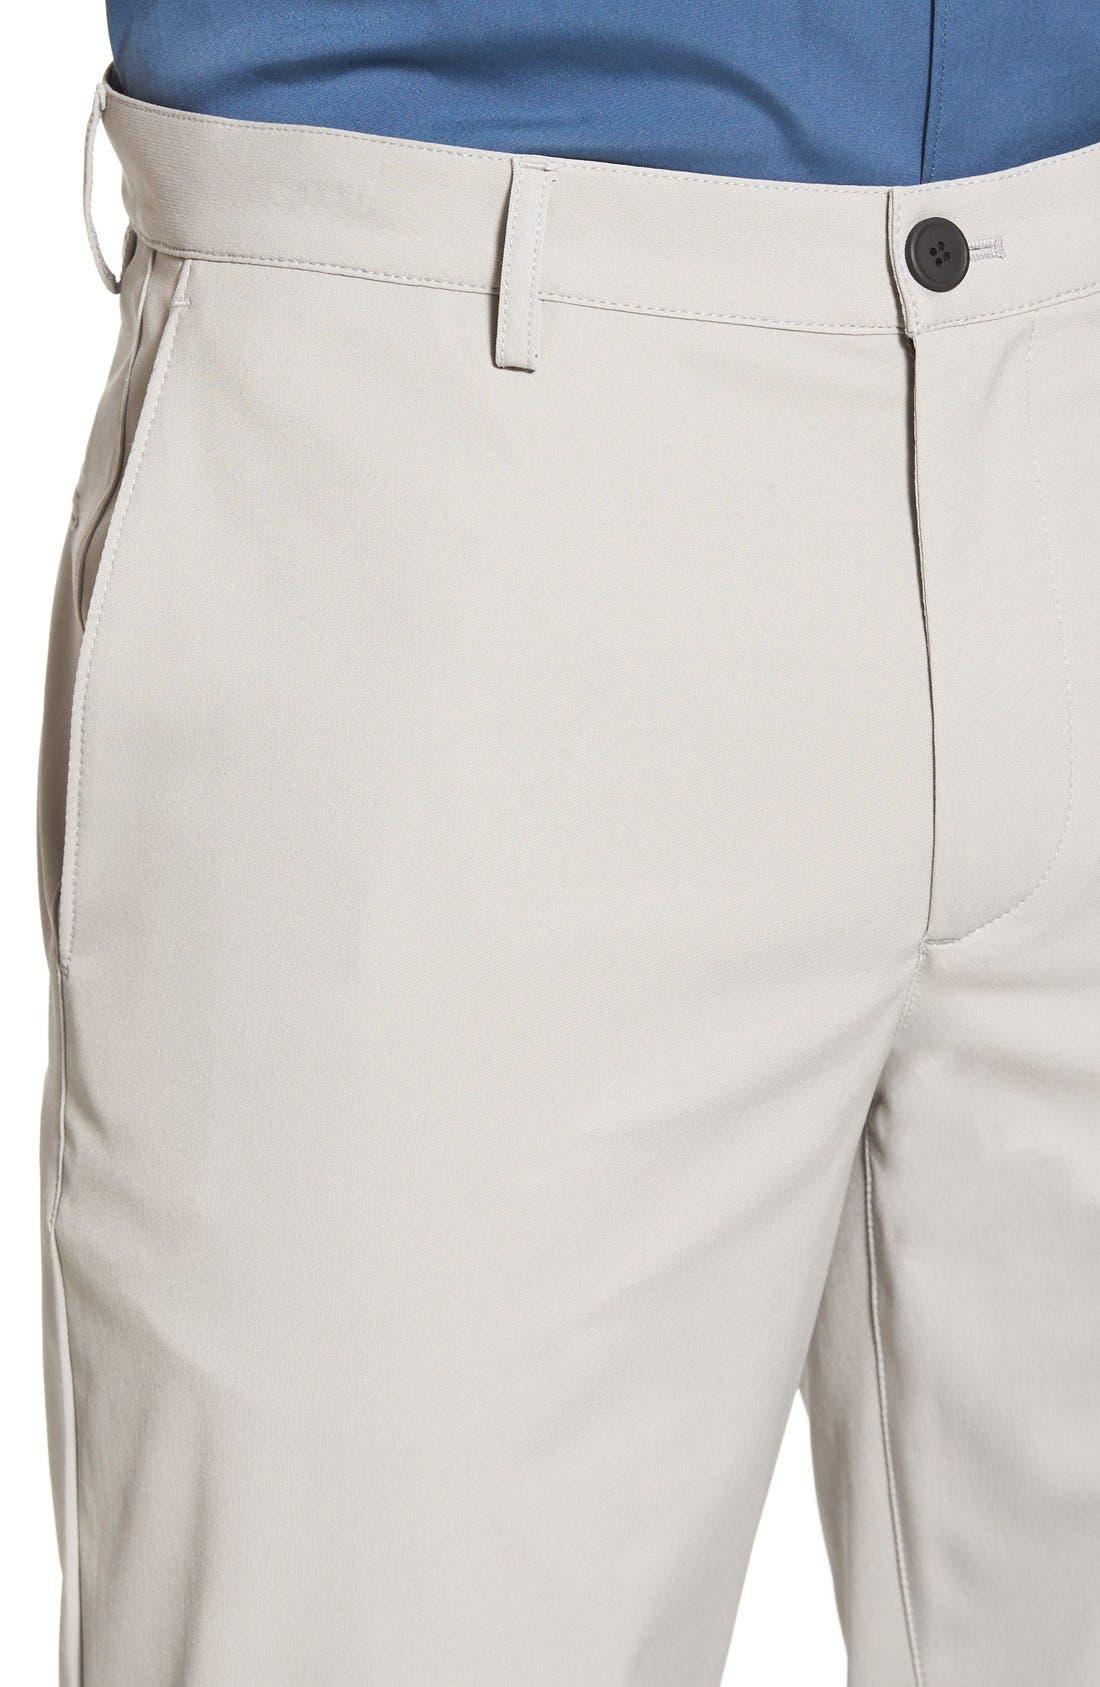 'Zaine Neoteric' Slim Fit Pants,                             Alternate thumbnail 14, color,